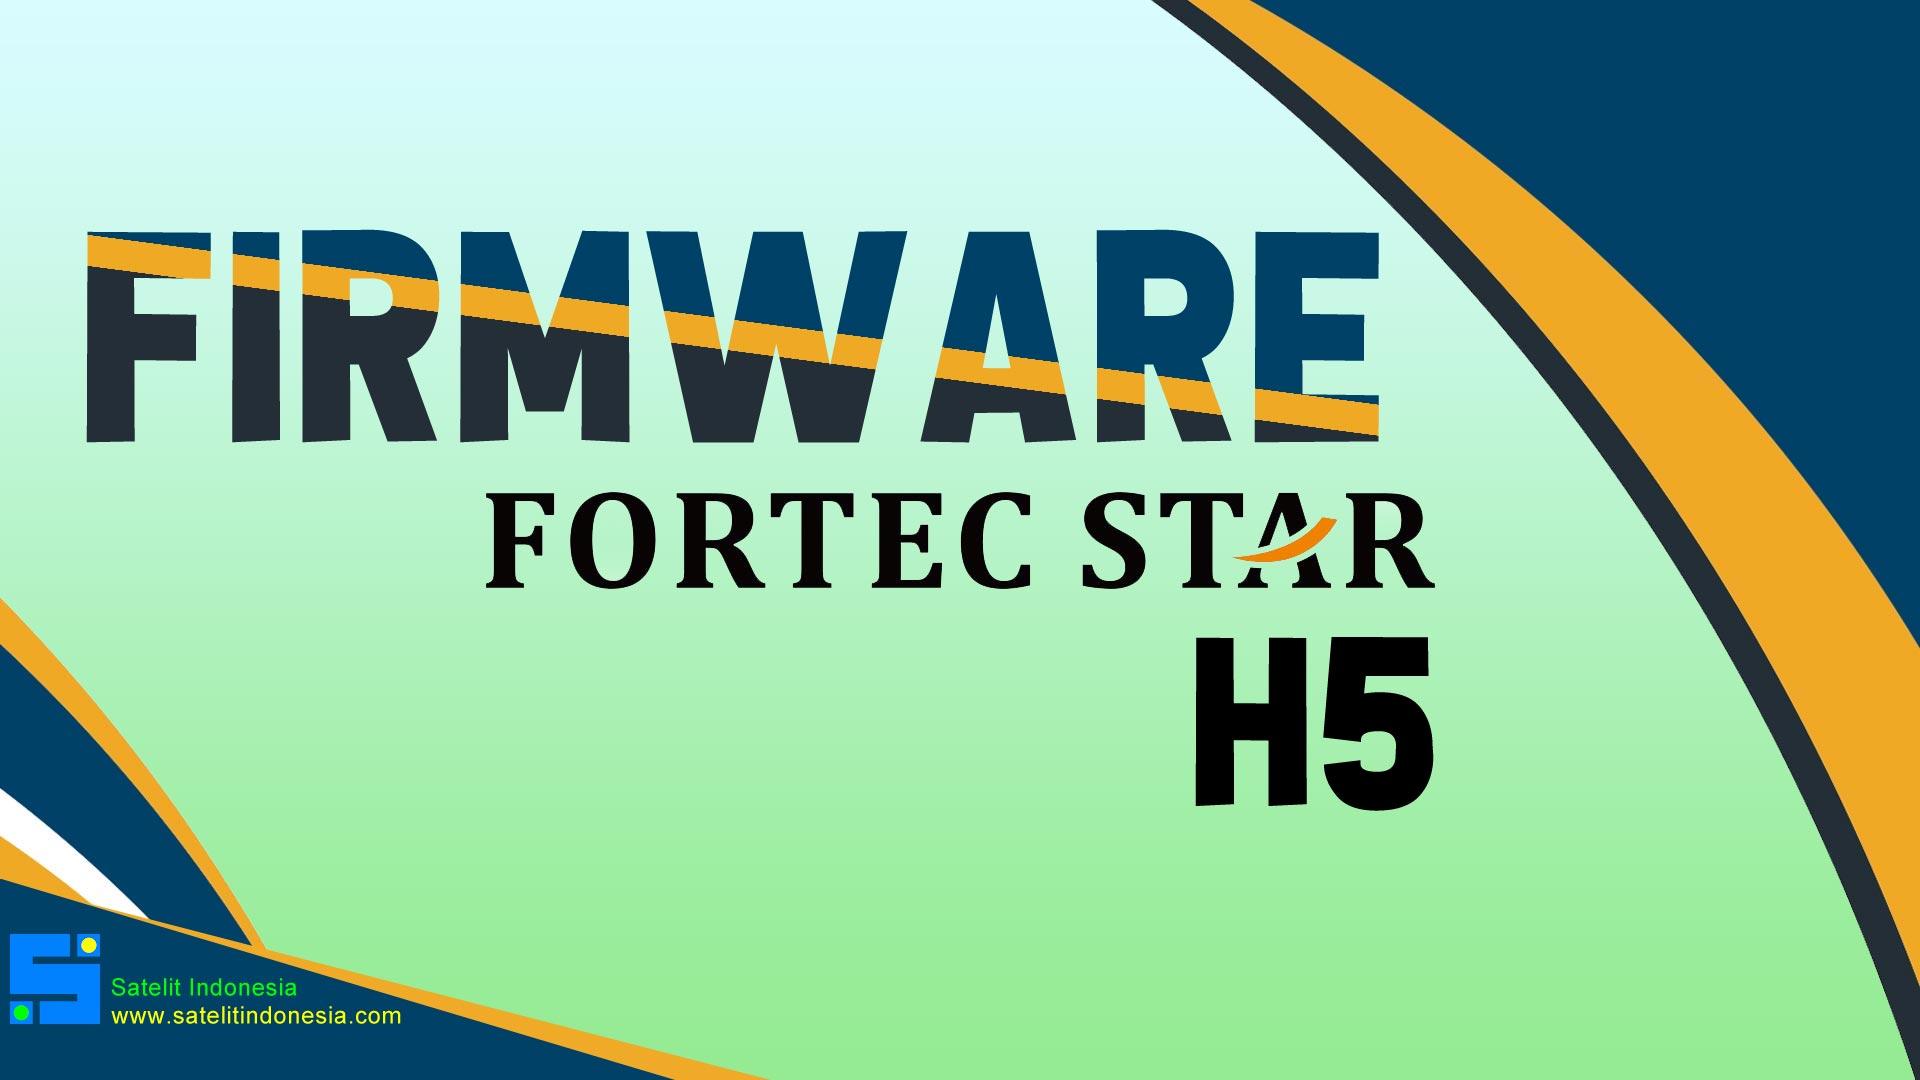 Download Software Fortec Star H5 Update Firmware Receiver